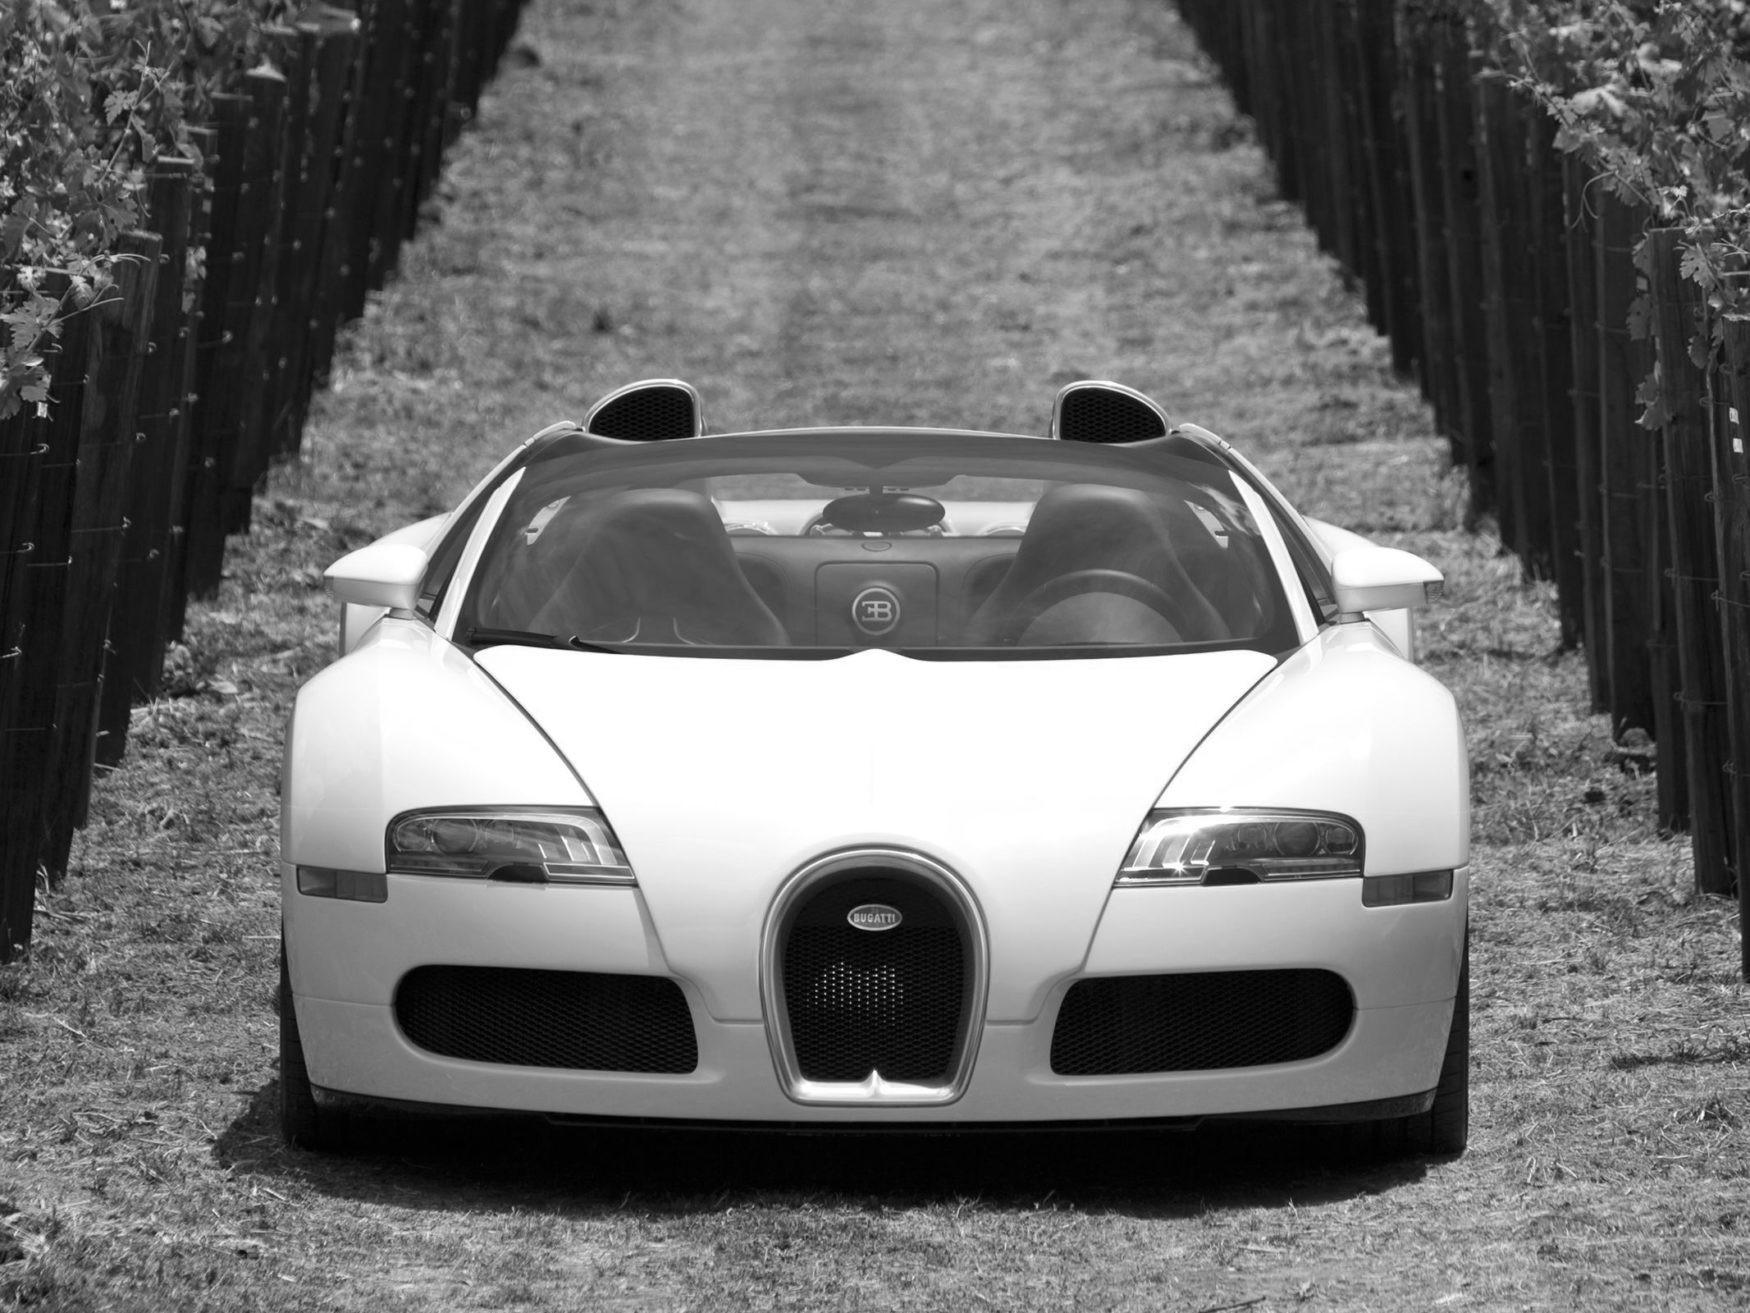 Bugatti-Veyron-Grand-Sport-Roadster-1-e1504672788845 Interesting Bugatti Veyron Price United States Cars Trend